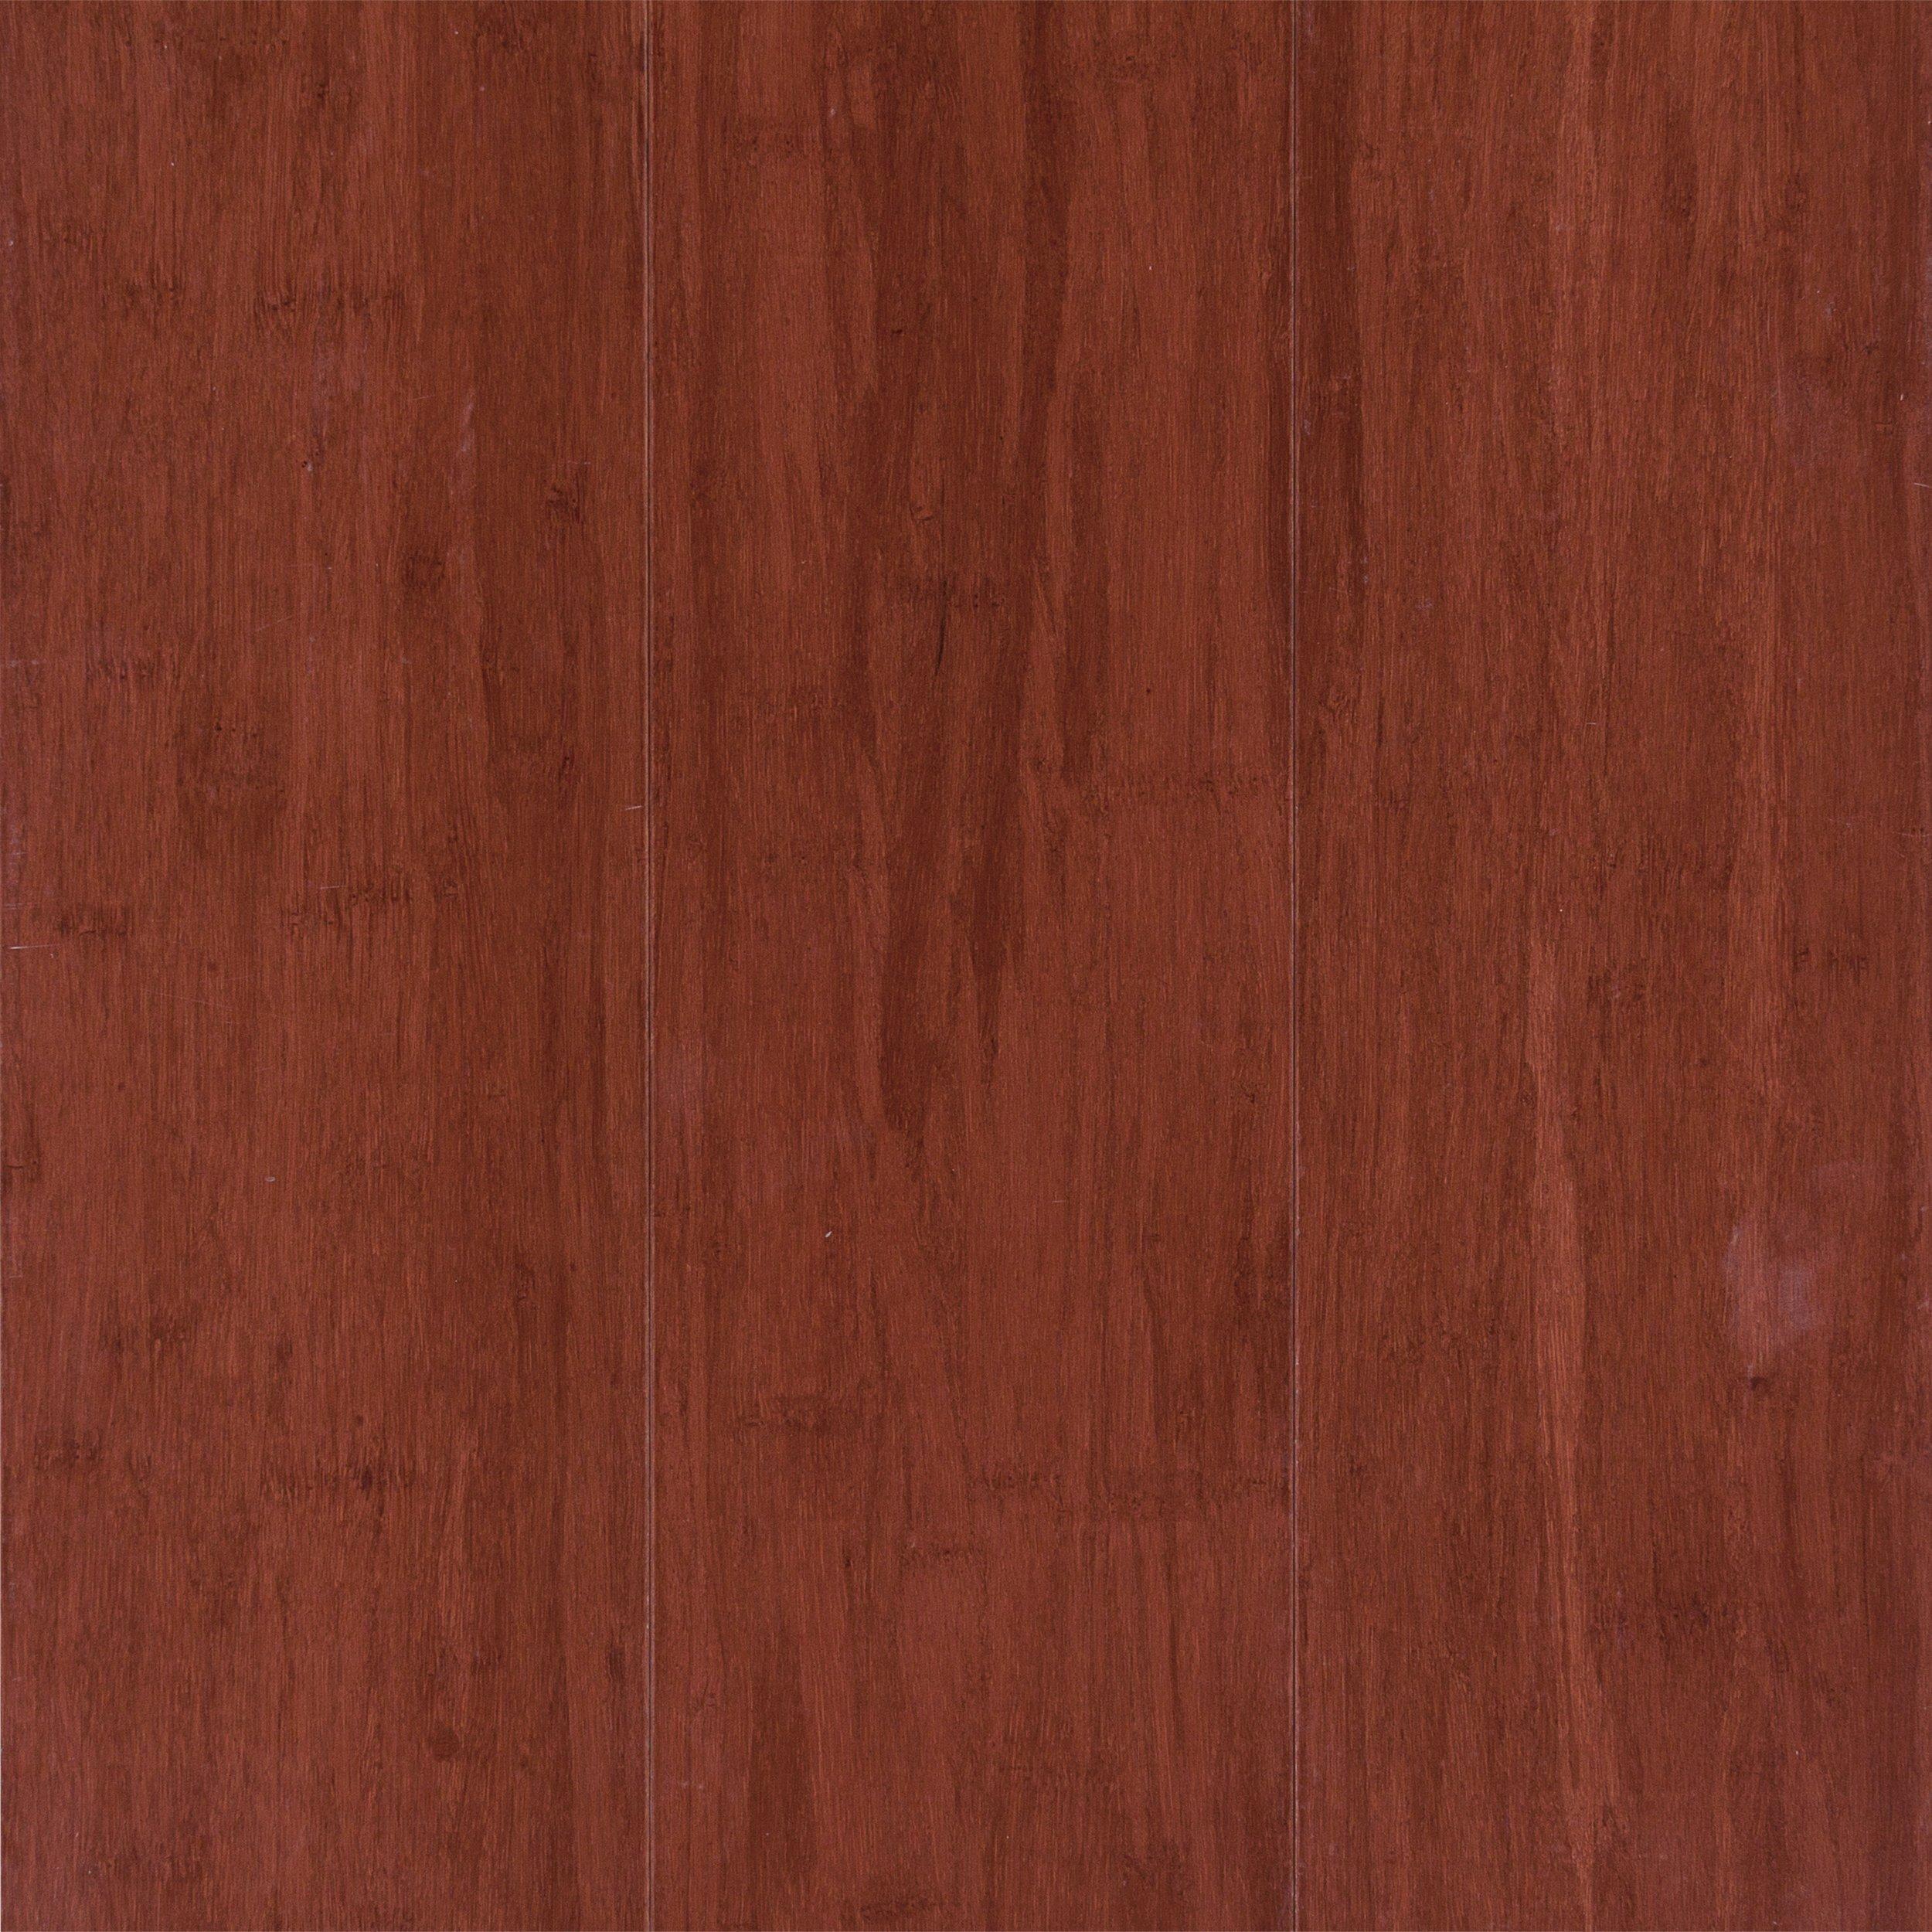 Cherry Locking Solid Stranded Bamboo Hardwood Engineered Hardwood Flooring Flooring